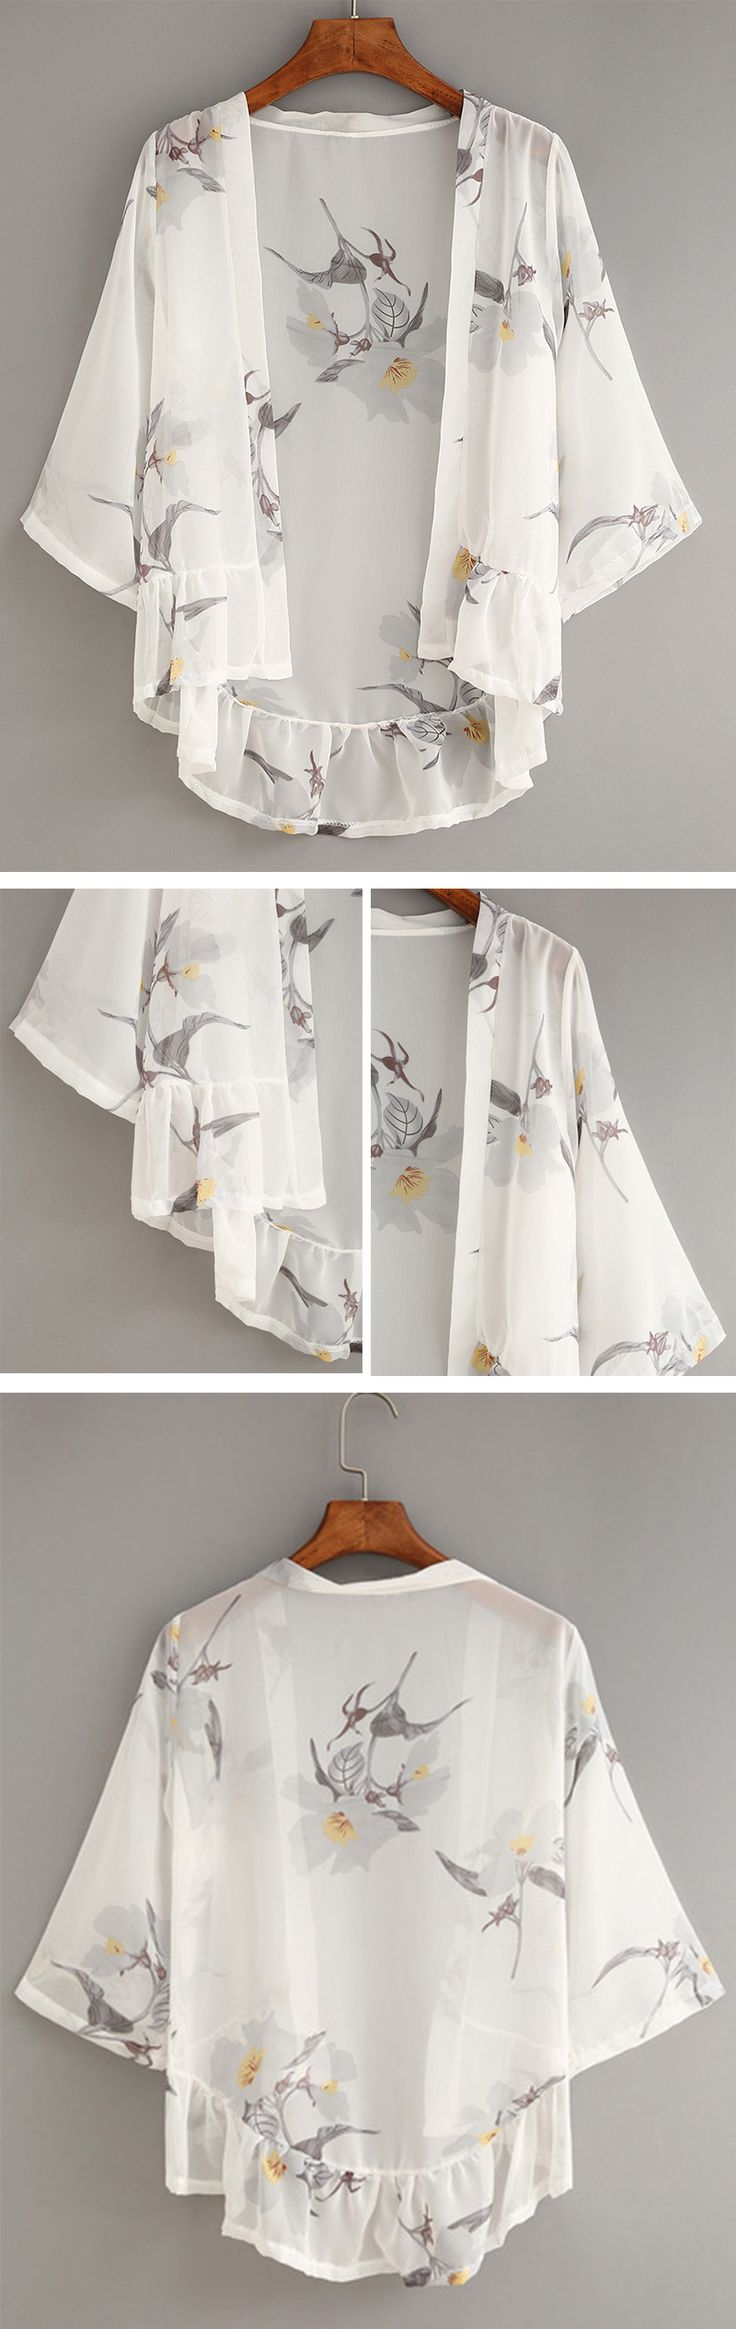 White Flower Print Ruffle Chiffon Kimono More                                                                                                                                                                                 More